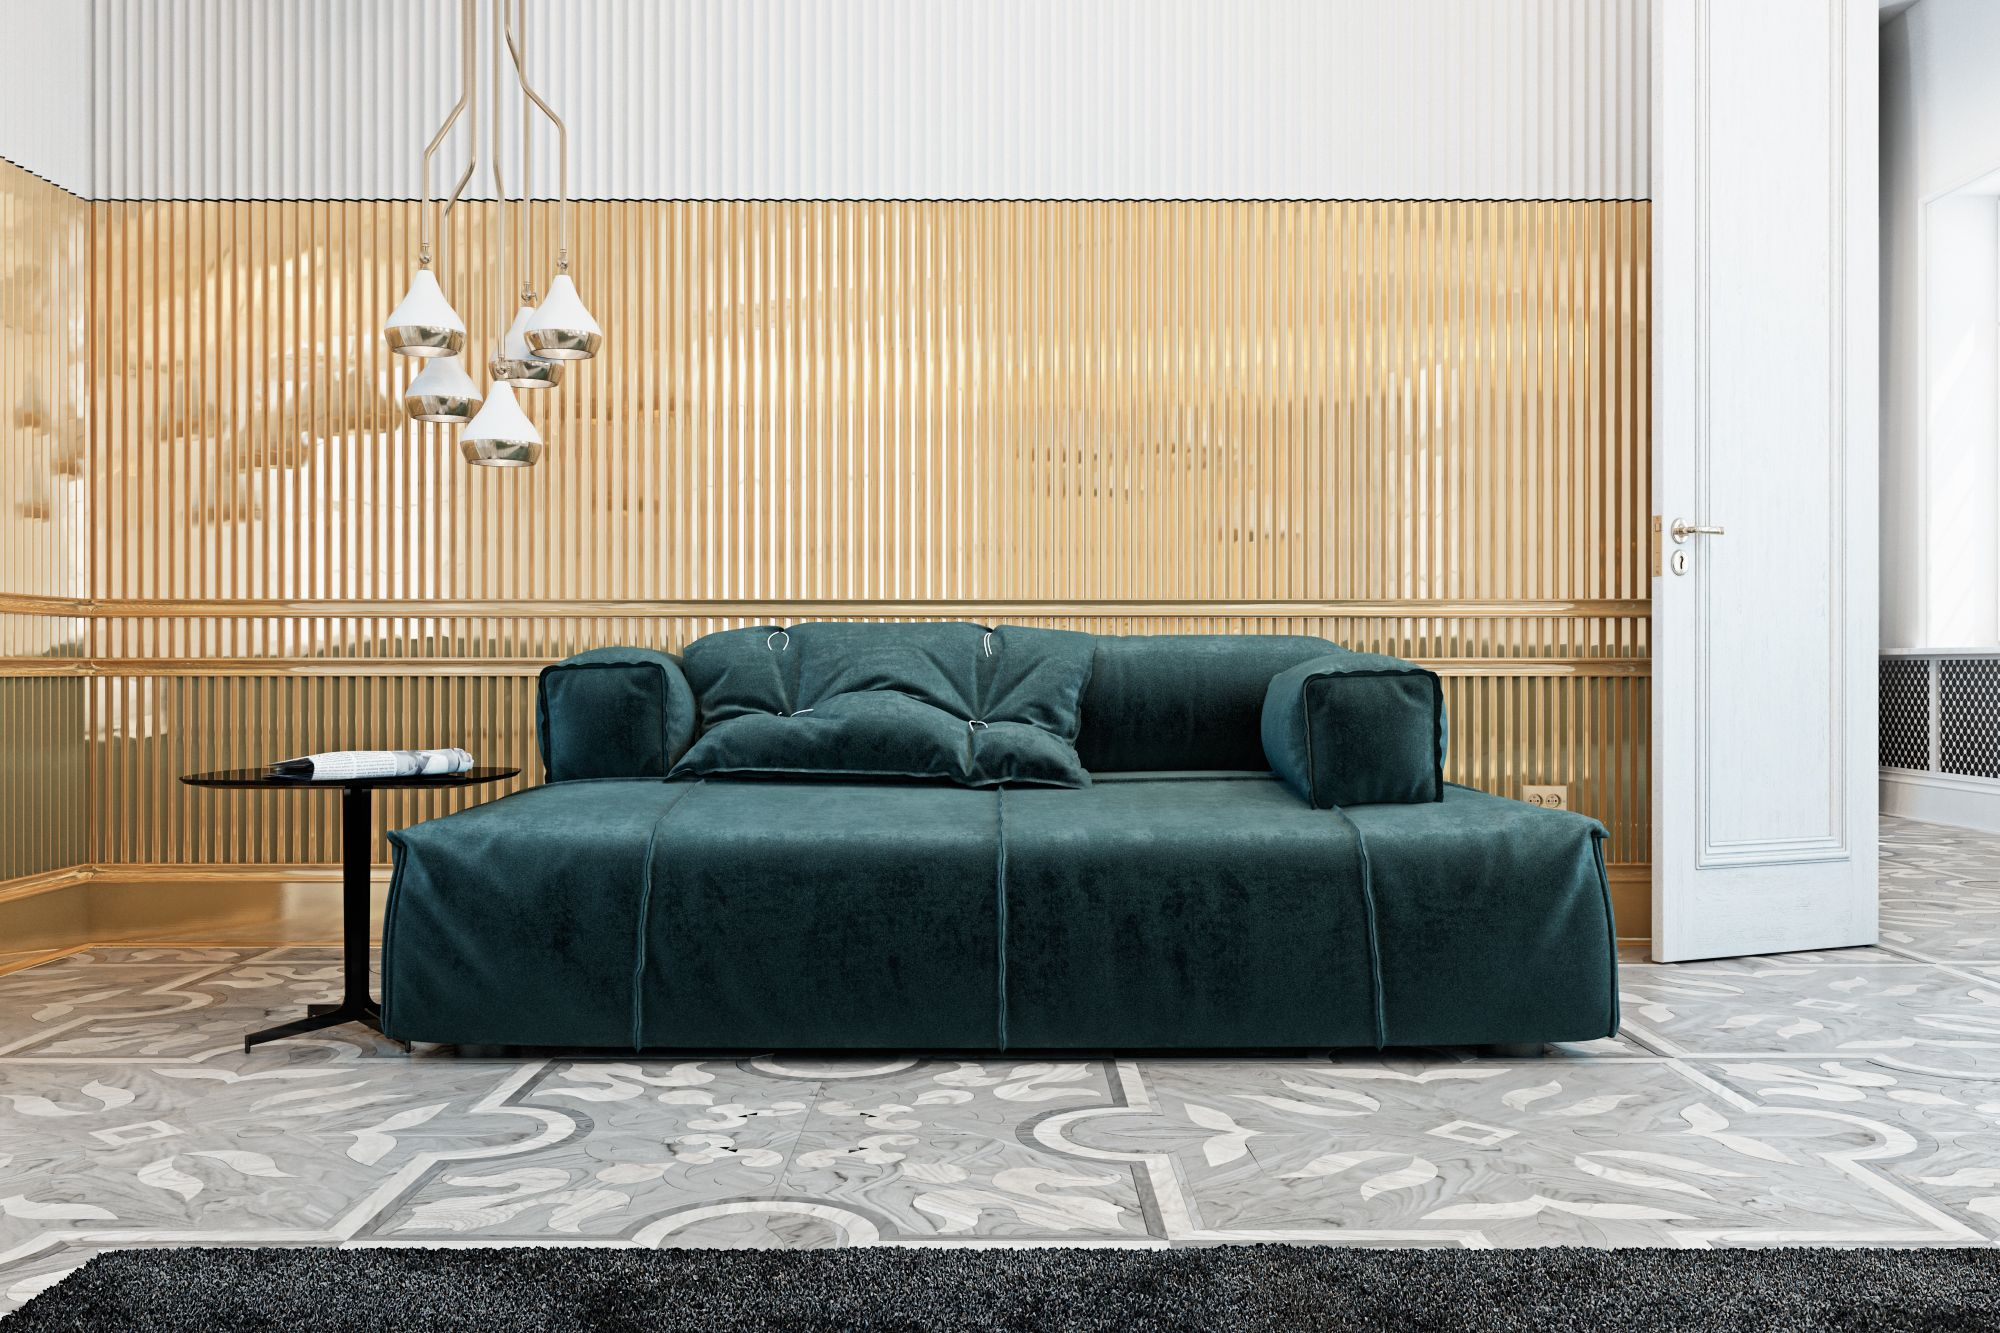 Luxury Living Room in Italian Contryside | www.livingroomideas.eu #modernhomedecor #livingroomideas #interiordesign #uniquelamps